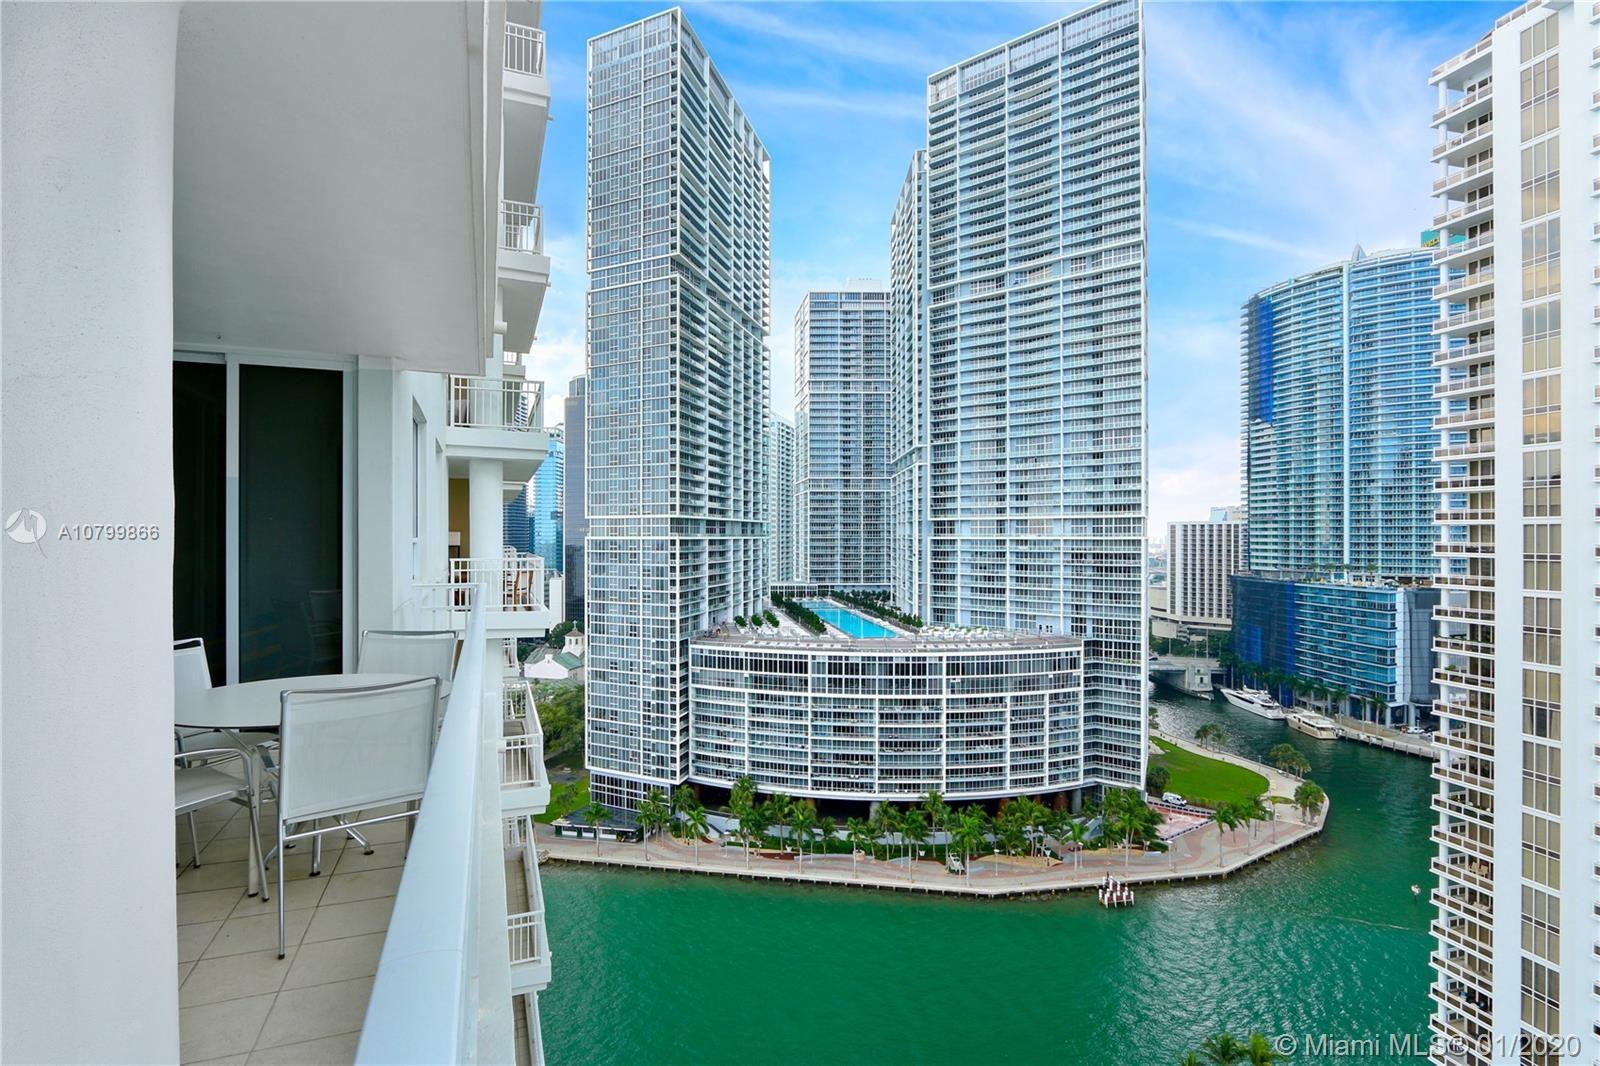 801 Brickell Key Blvd #2310, Miami, FL 33131 - #: A10799866